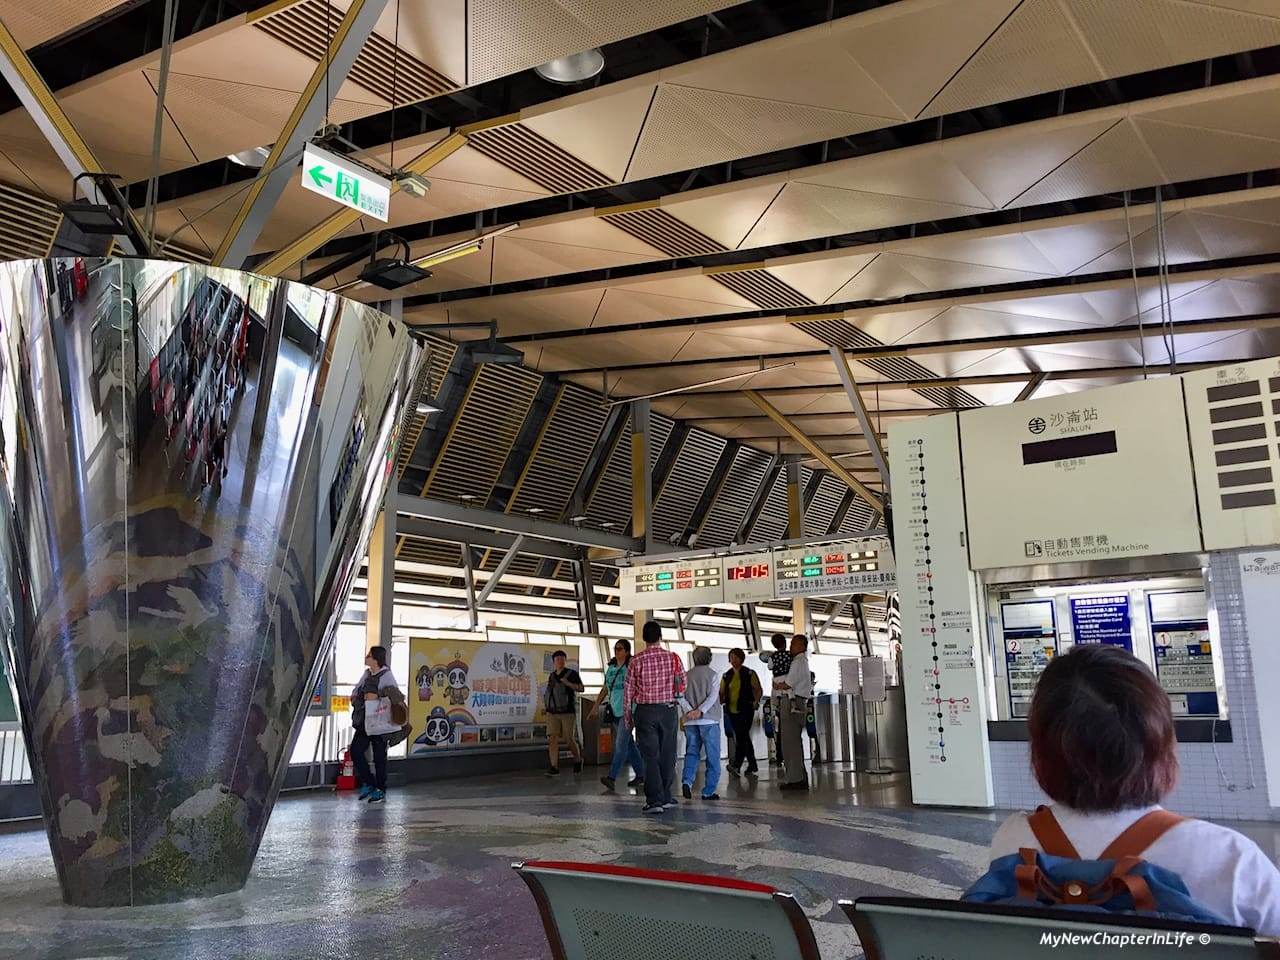 在沙崙站等待往台南市的台鐵列車 Waiting for next local train to Tainan City